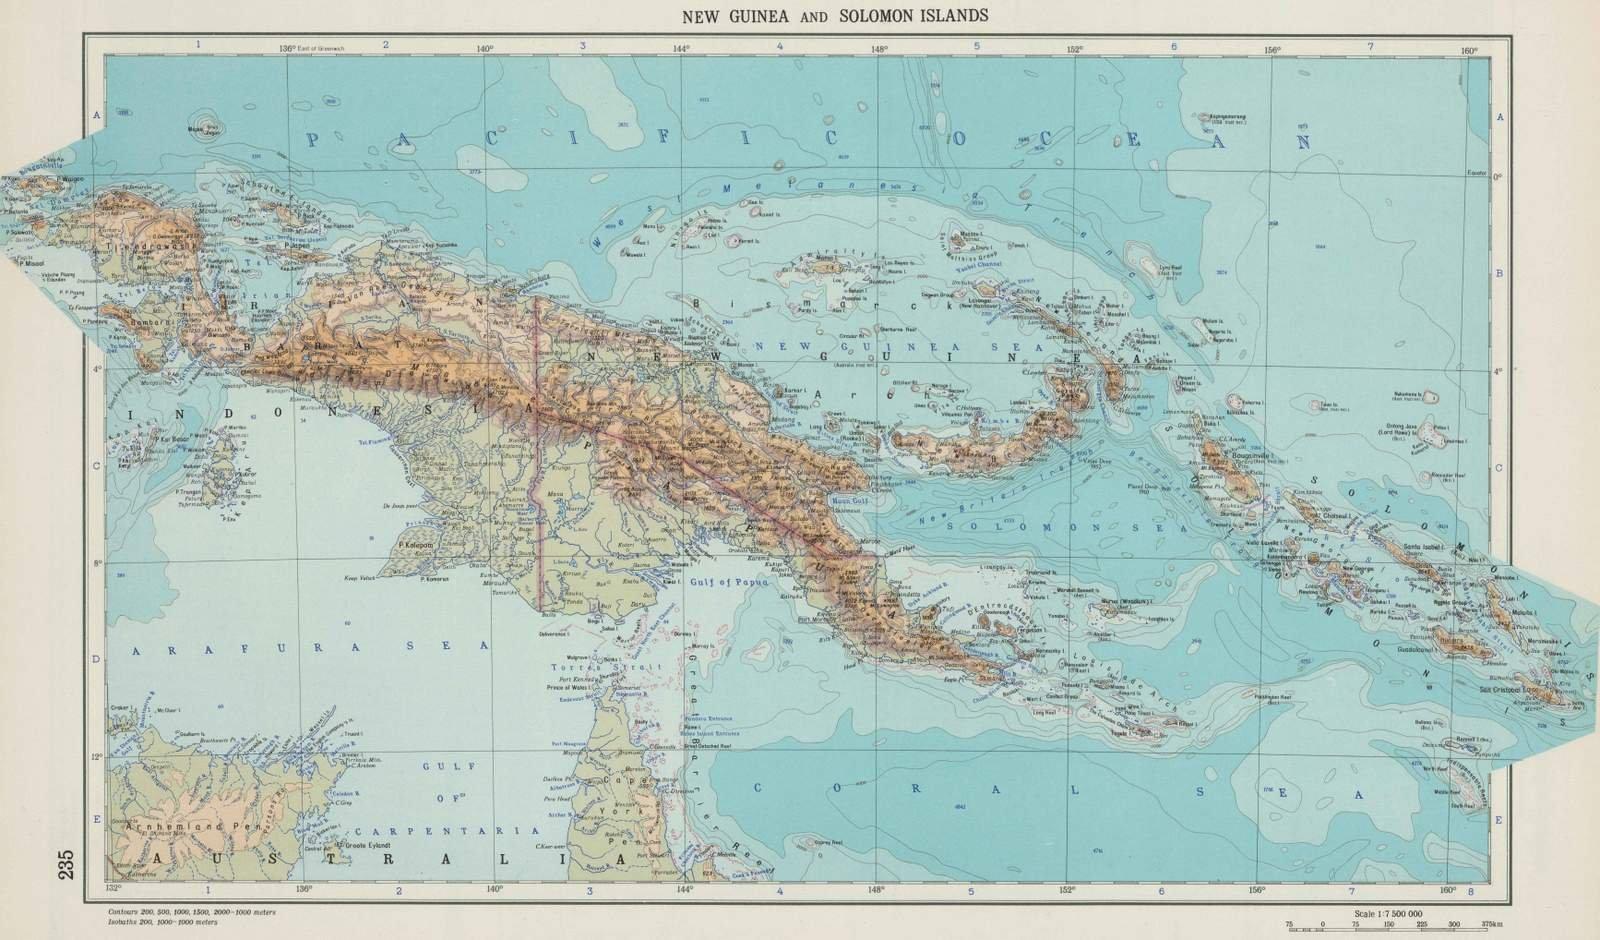 Cheap World Map Maldives Islands Find World Map Maldives